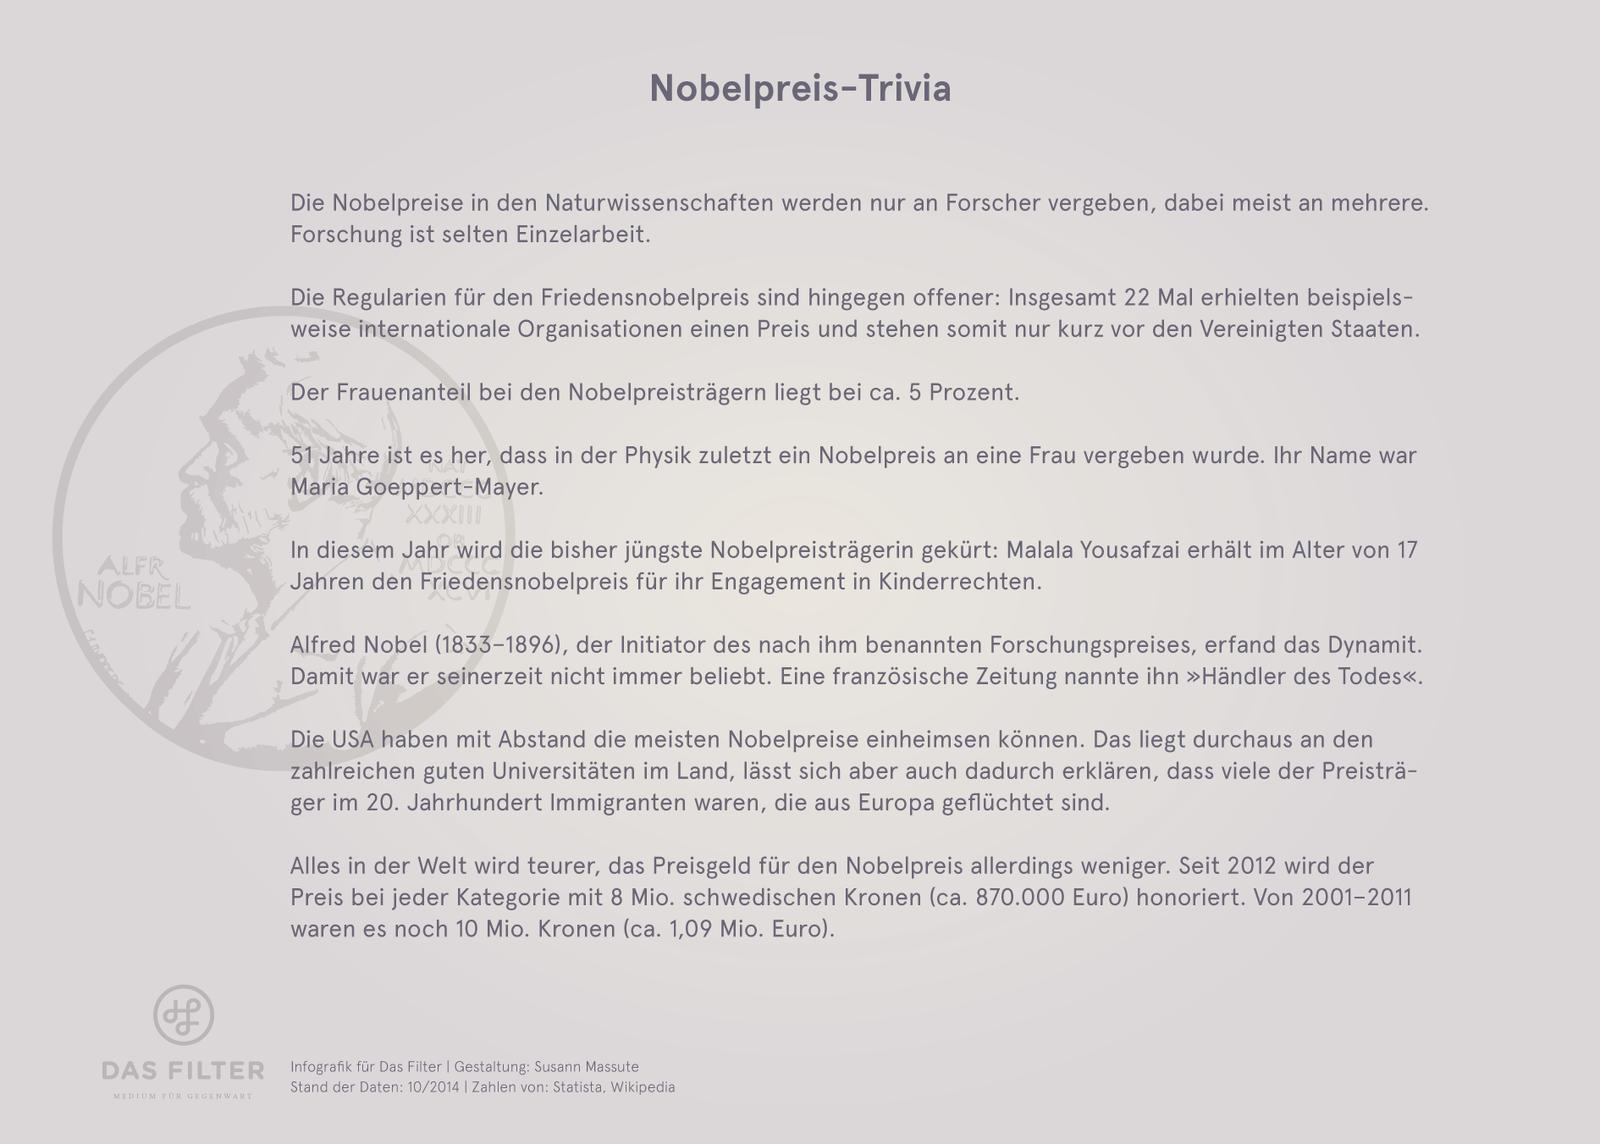 DF Nobelpreis 06